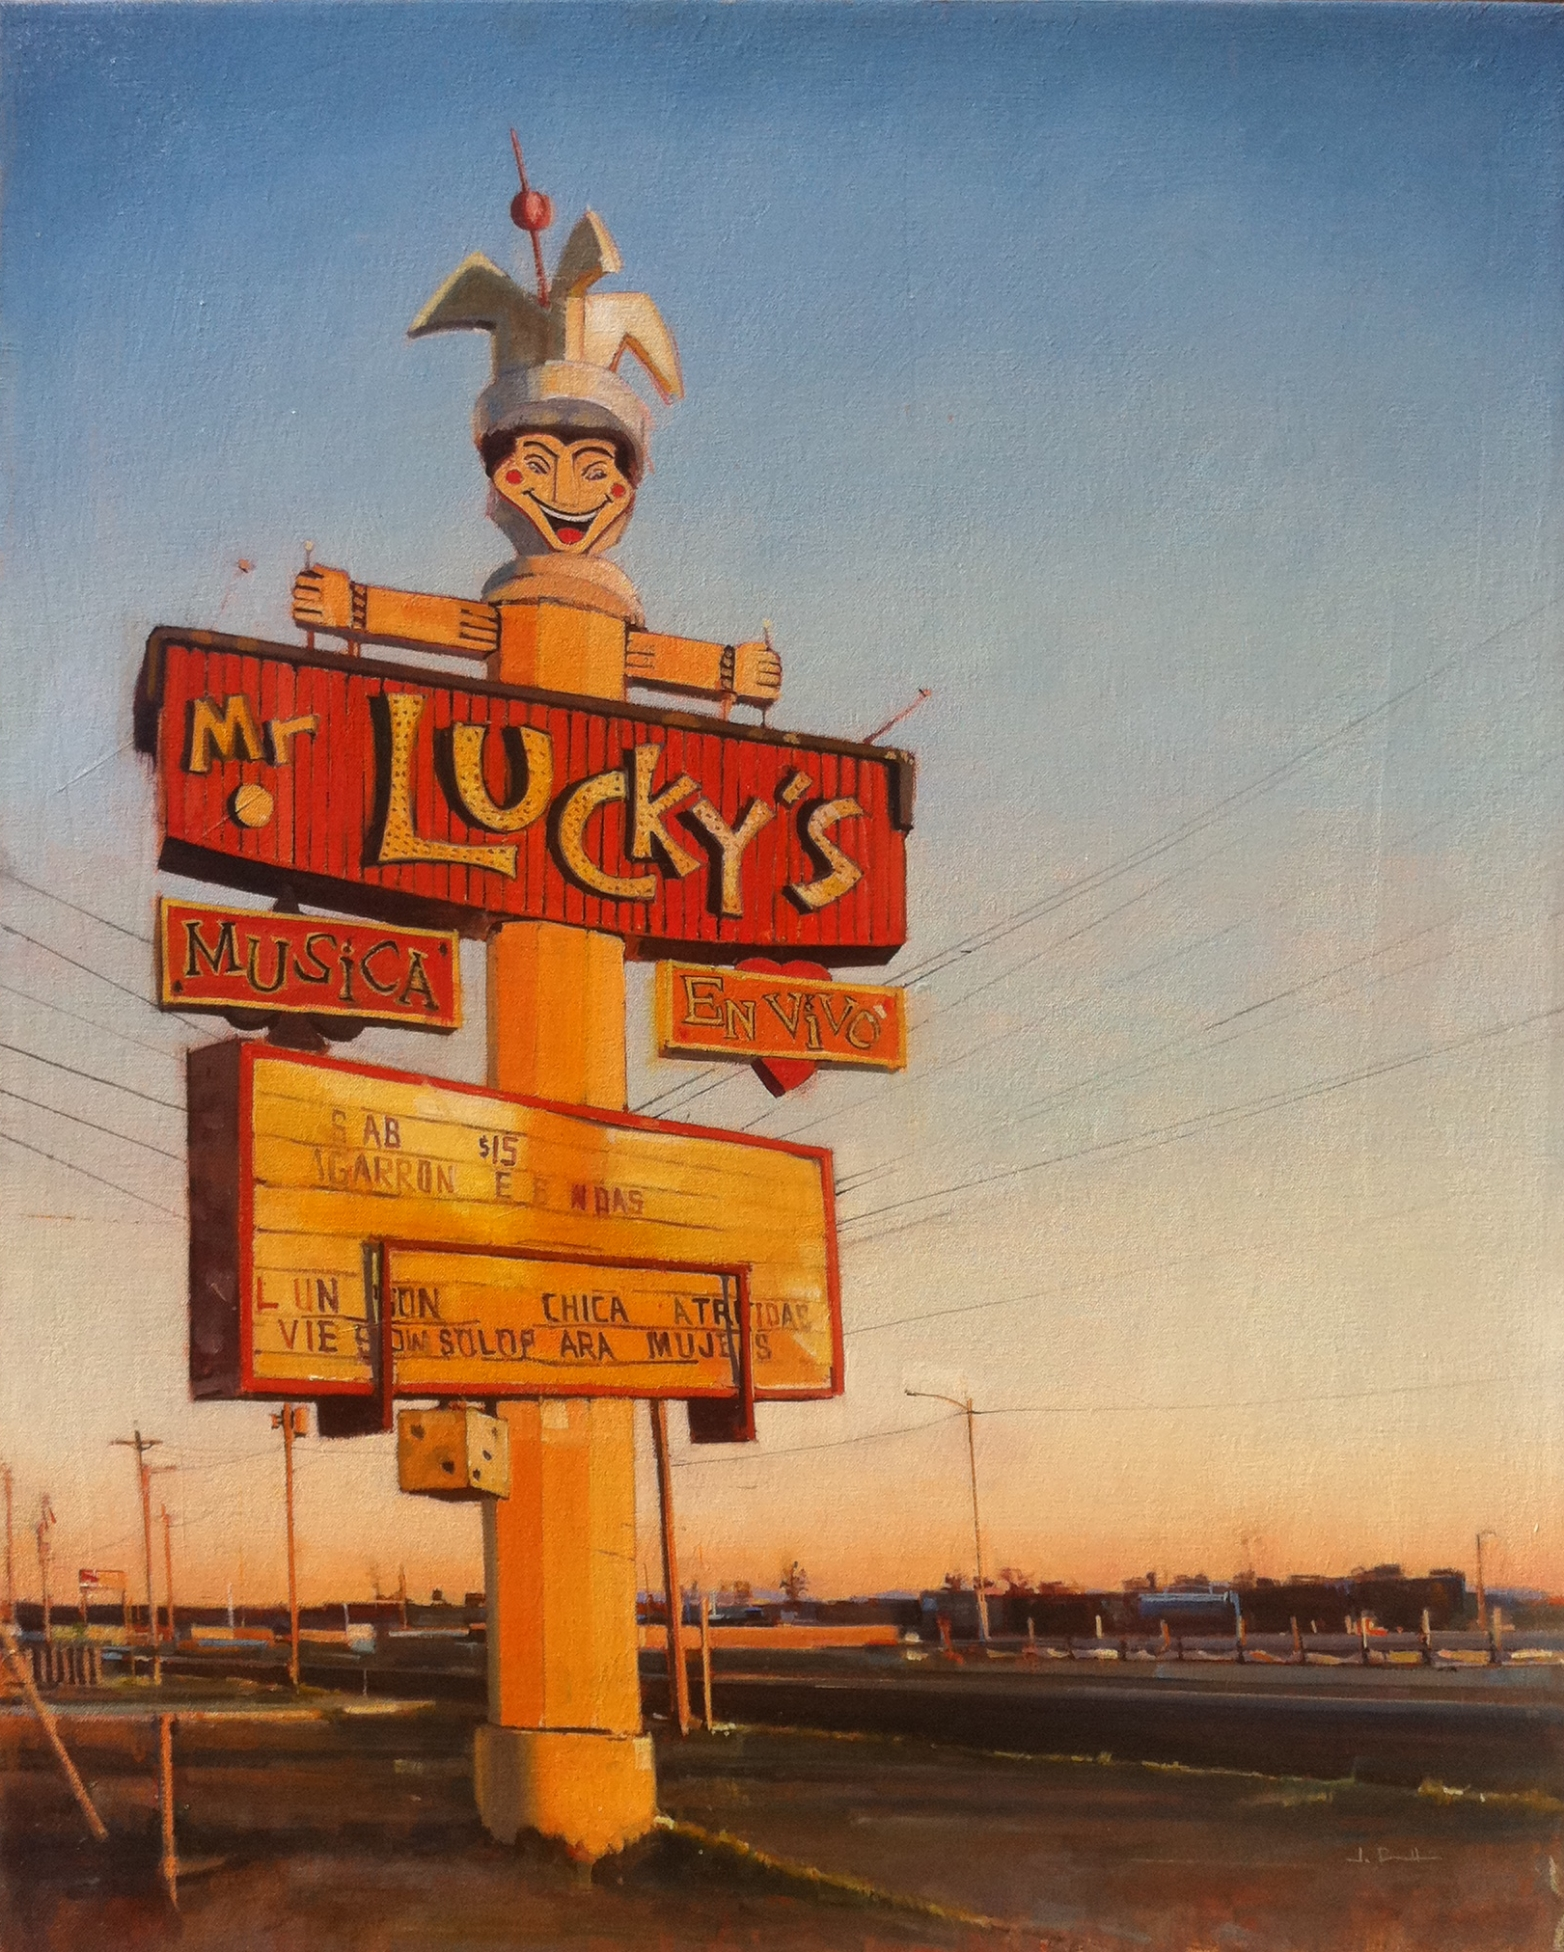 Mr. Lucky's